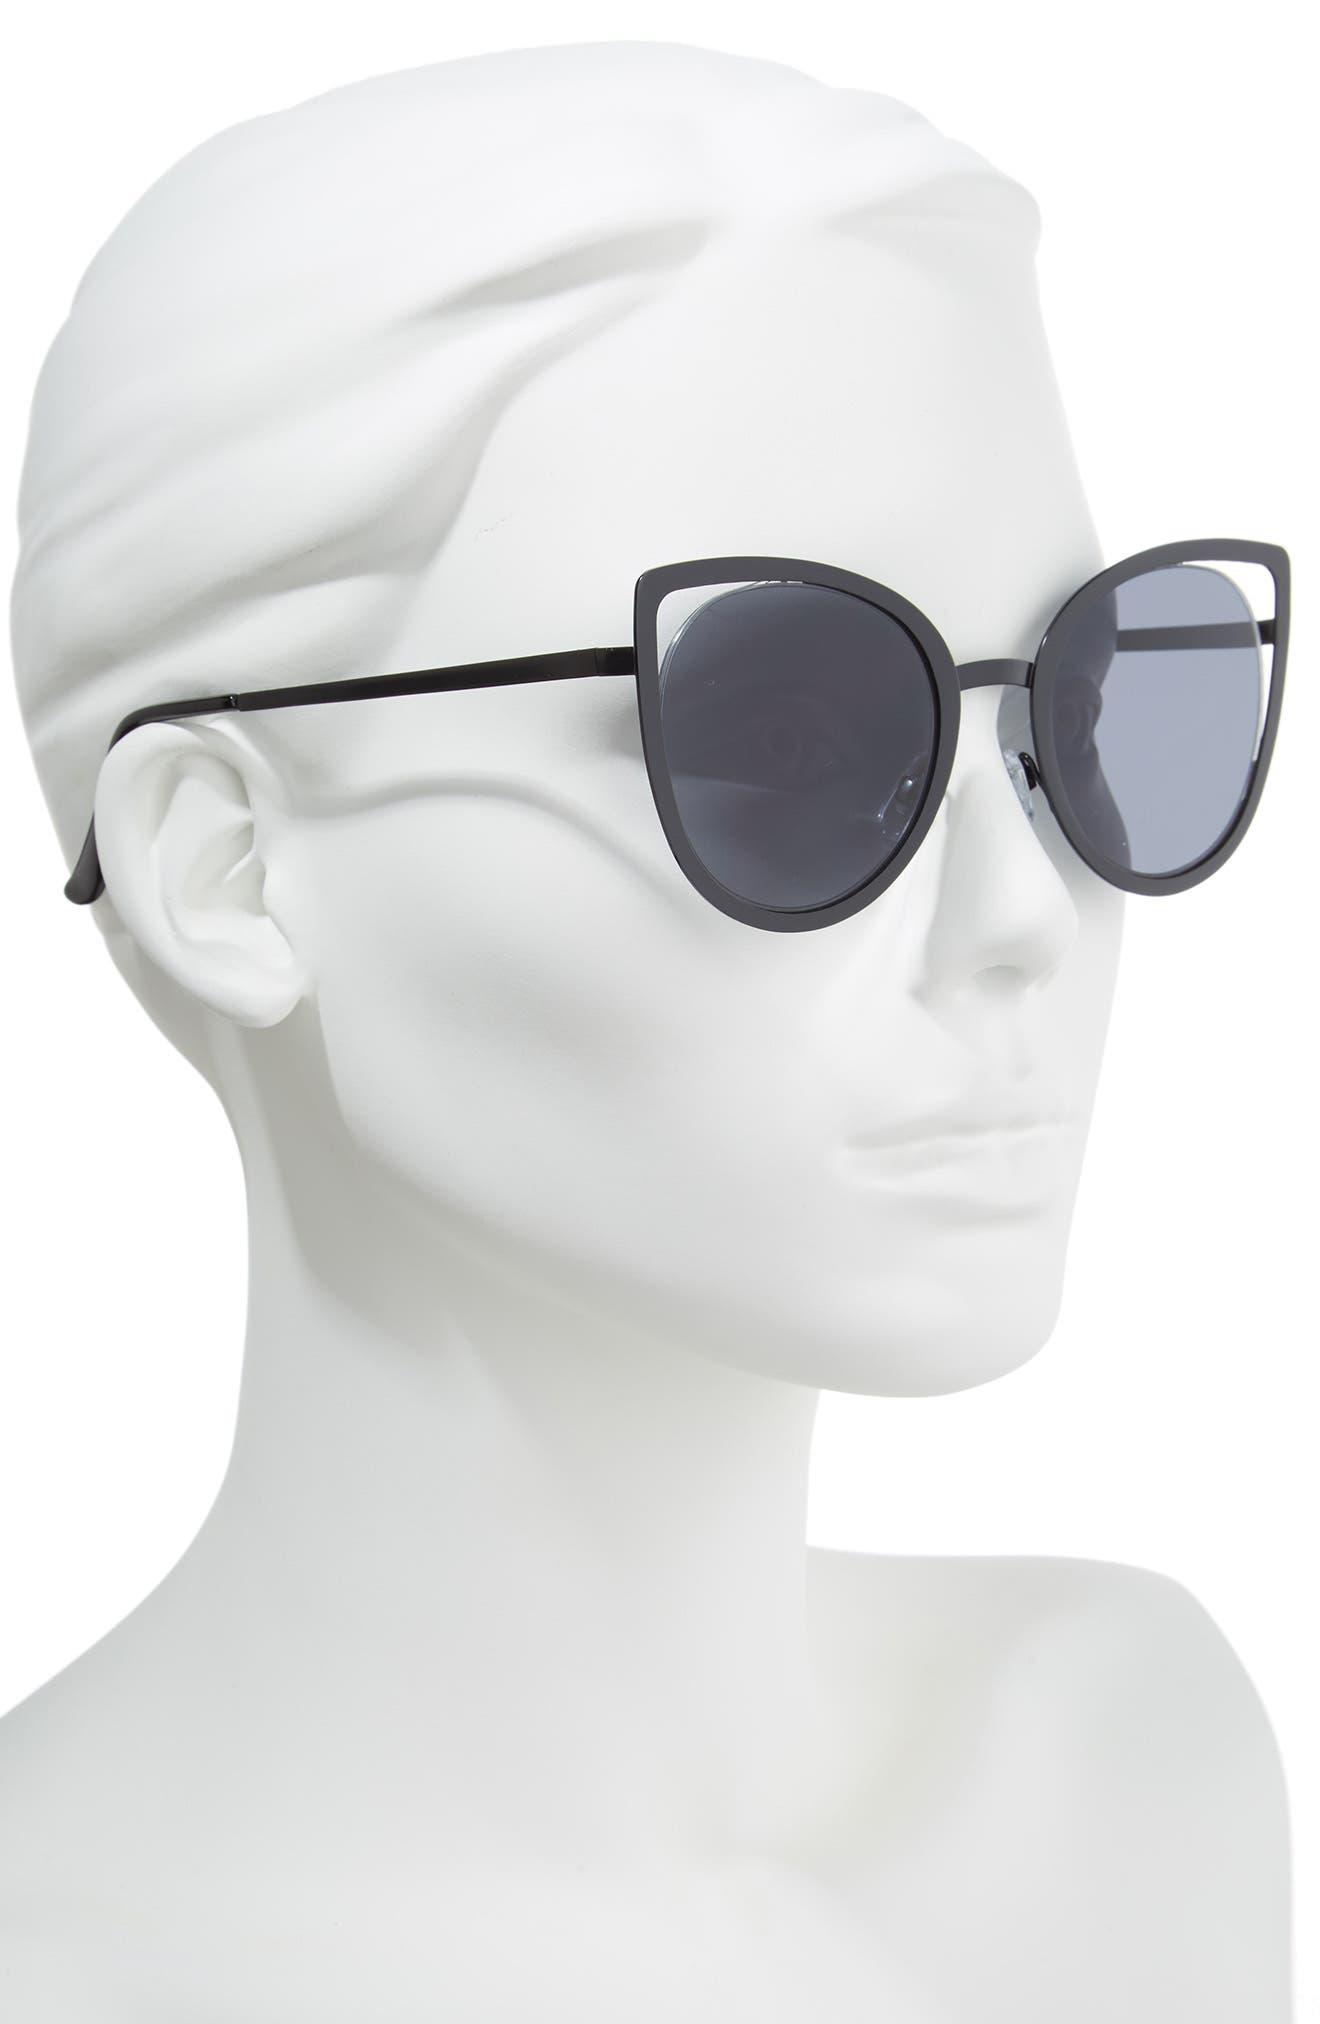 53mm Cutout Cat Eye Sunglasses,                             Alternate thumbnail 2, color,                             001